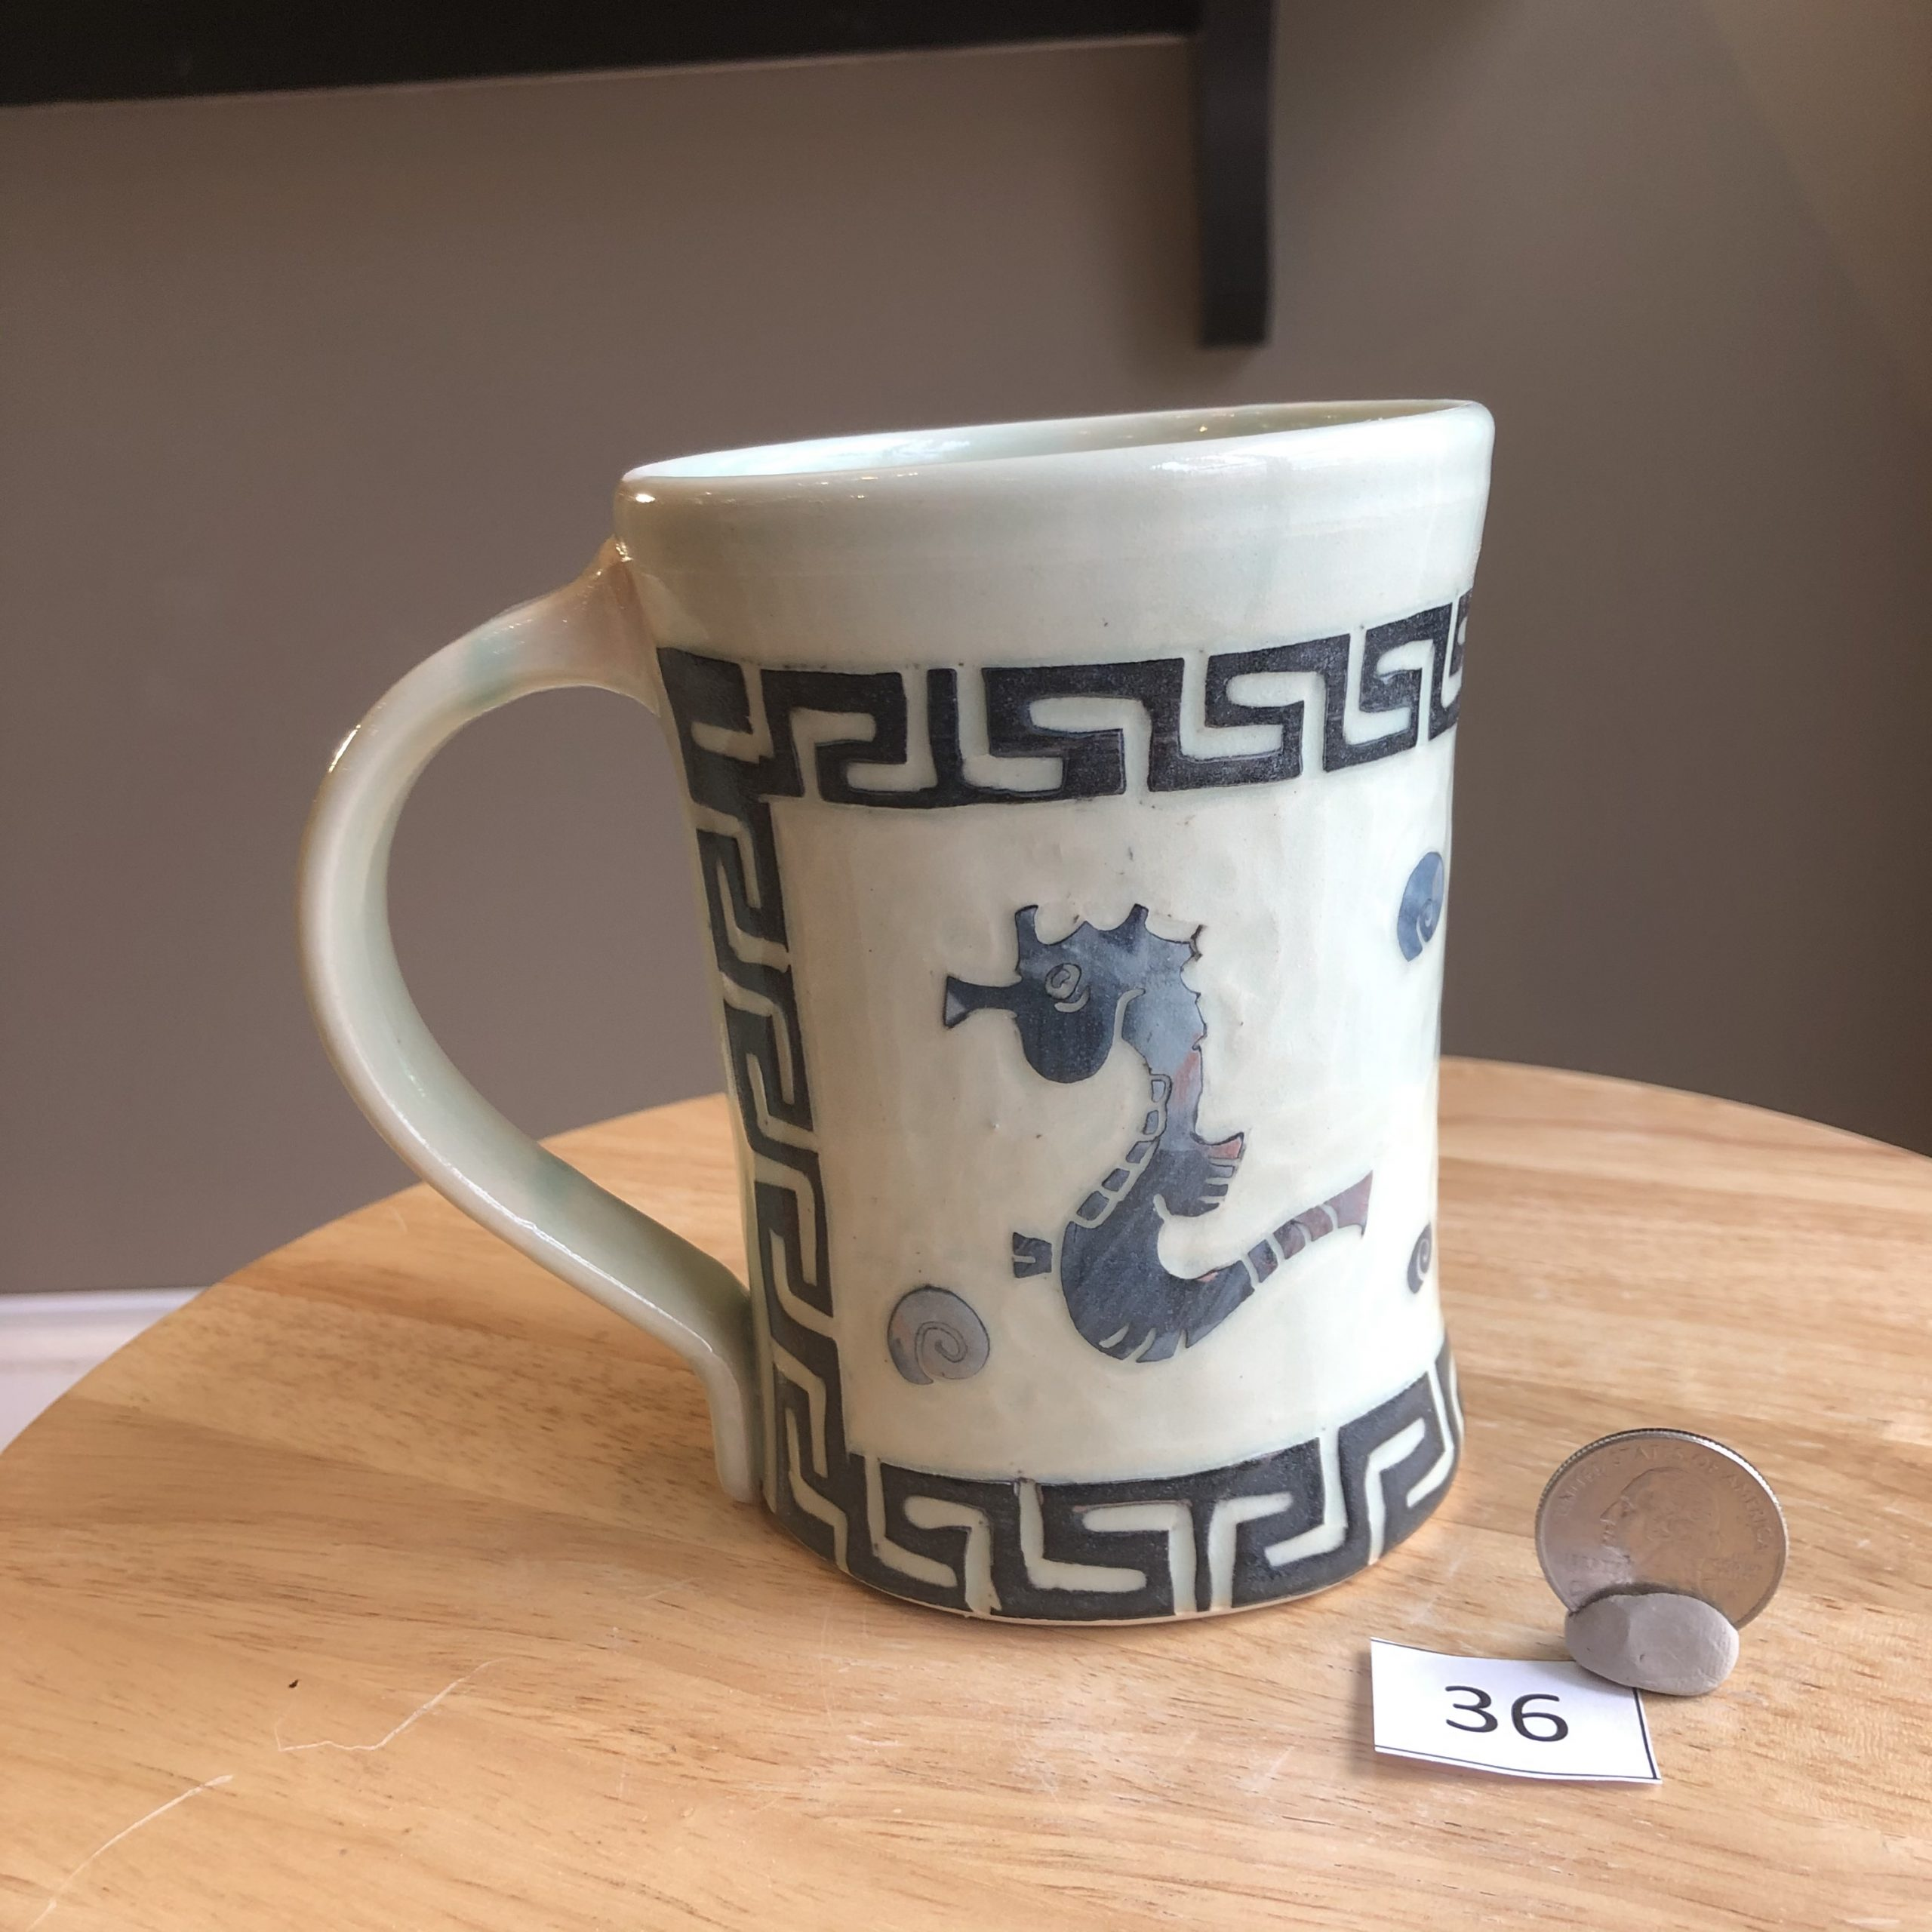 Neal Reed Seahorse w/ Border Mug #36